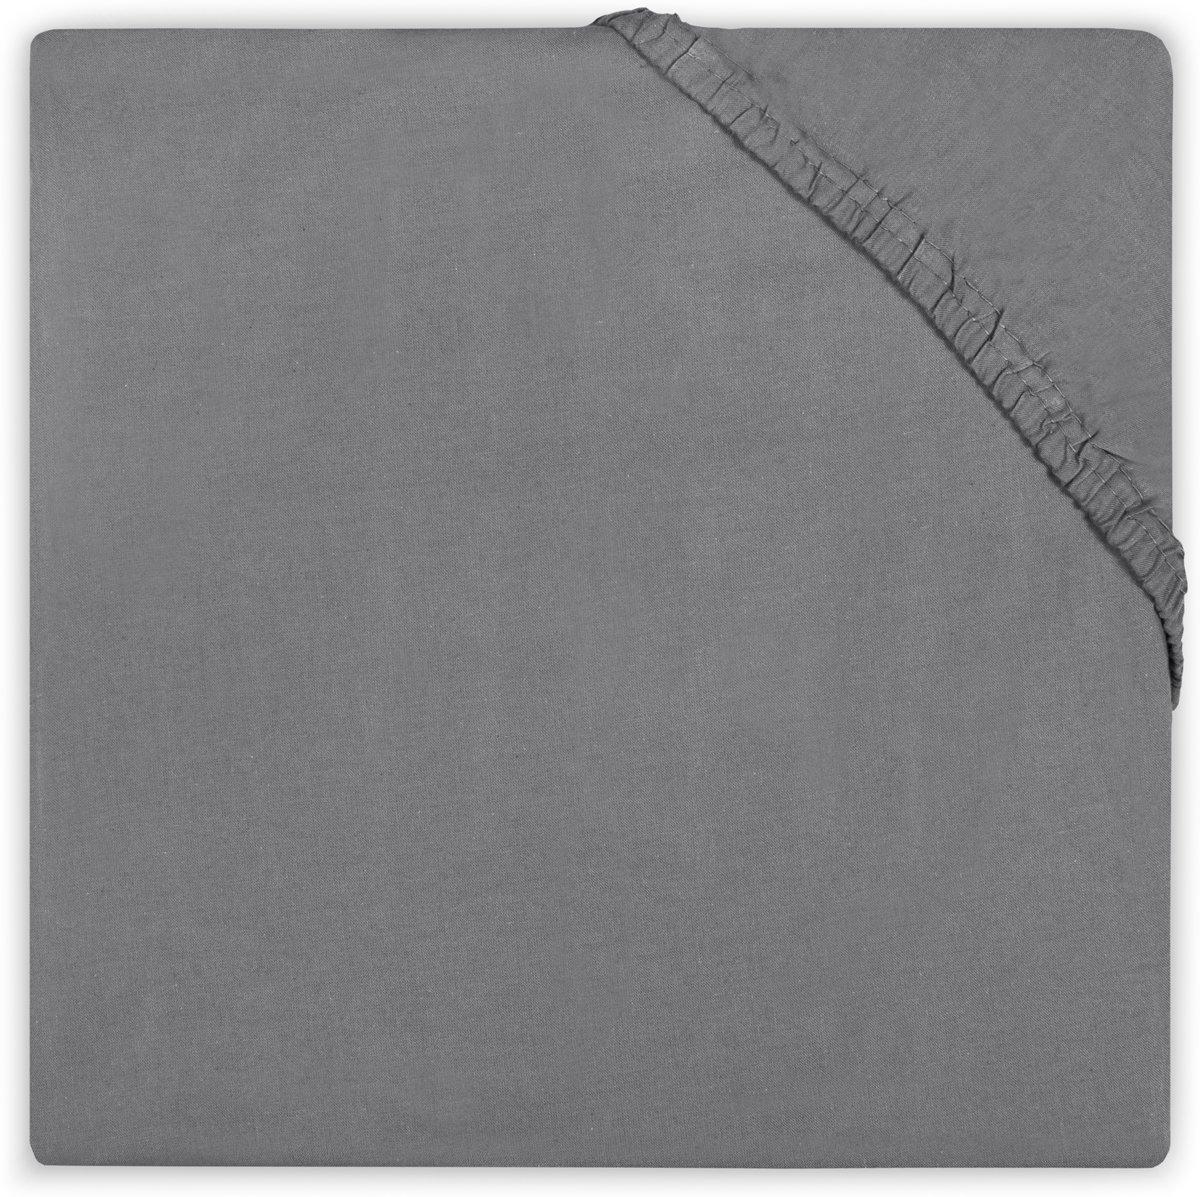 Little Lemonade Hoeslaken jersey 70x140/75x150cm dark grey